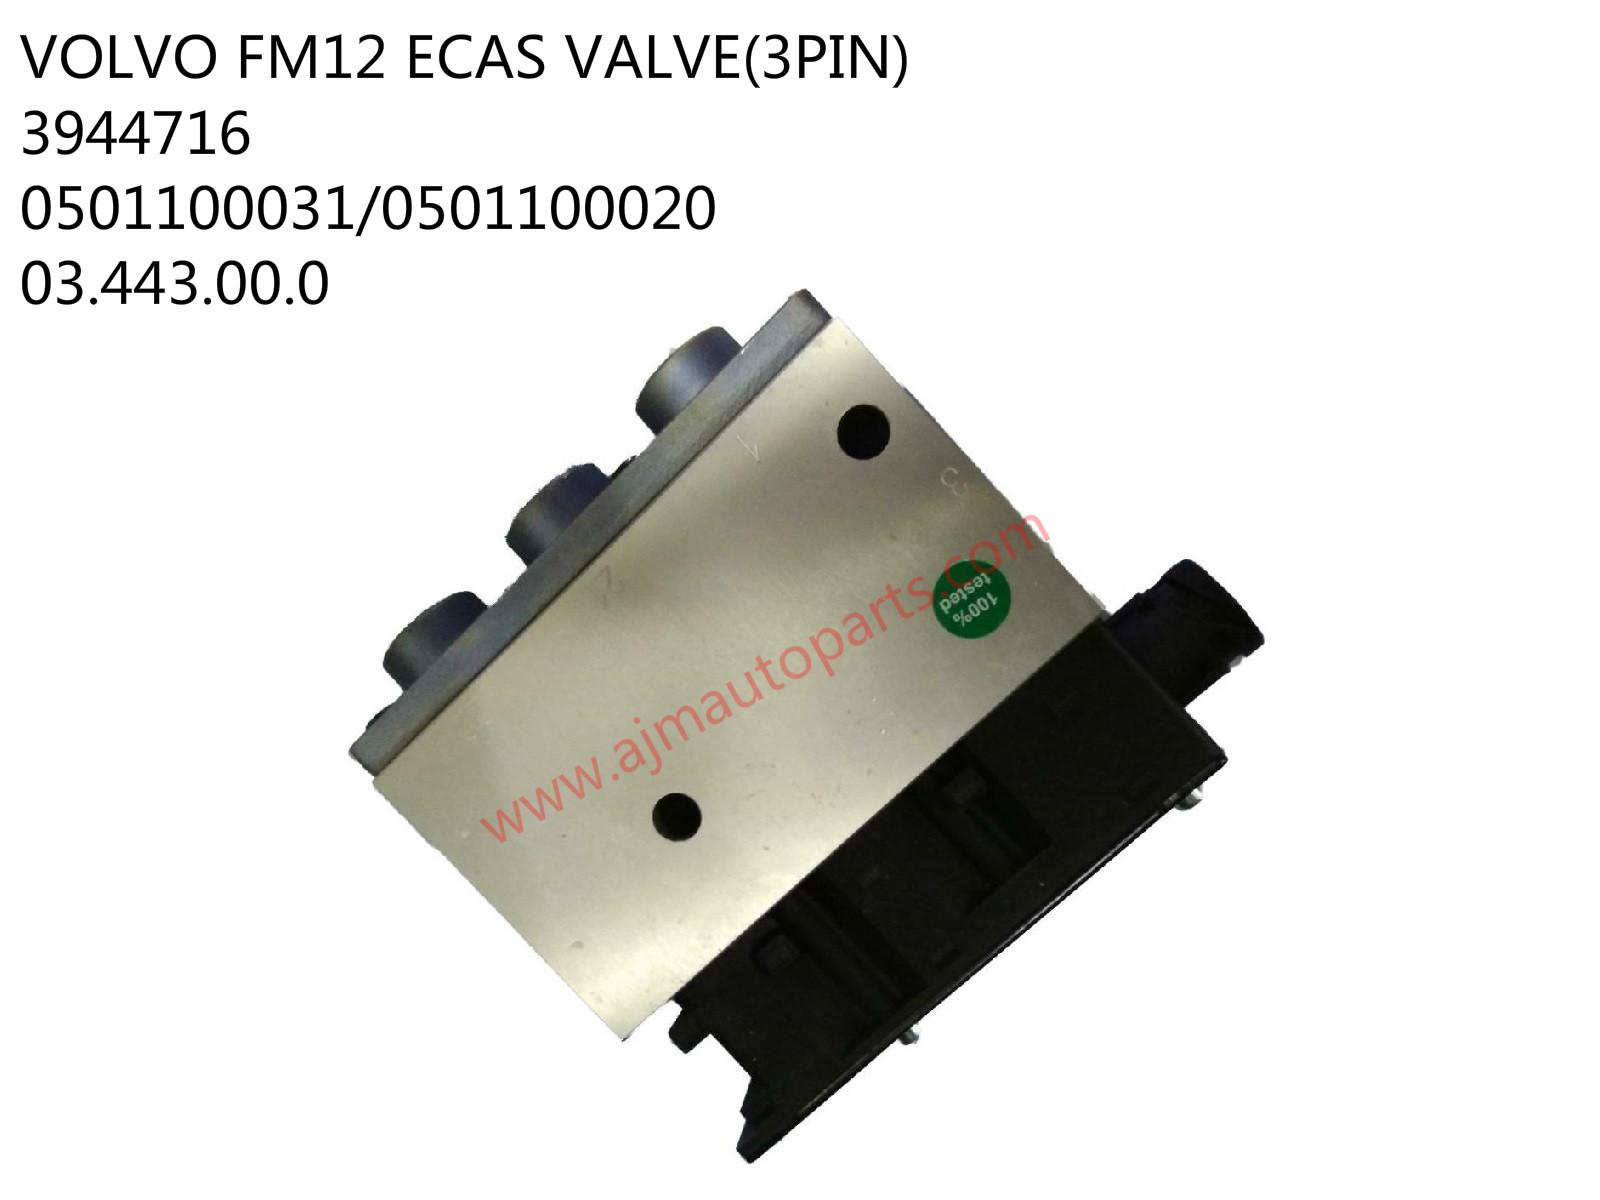 VOLVO FM12 ECAS VALVE-3944716/0501100031/0501100020